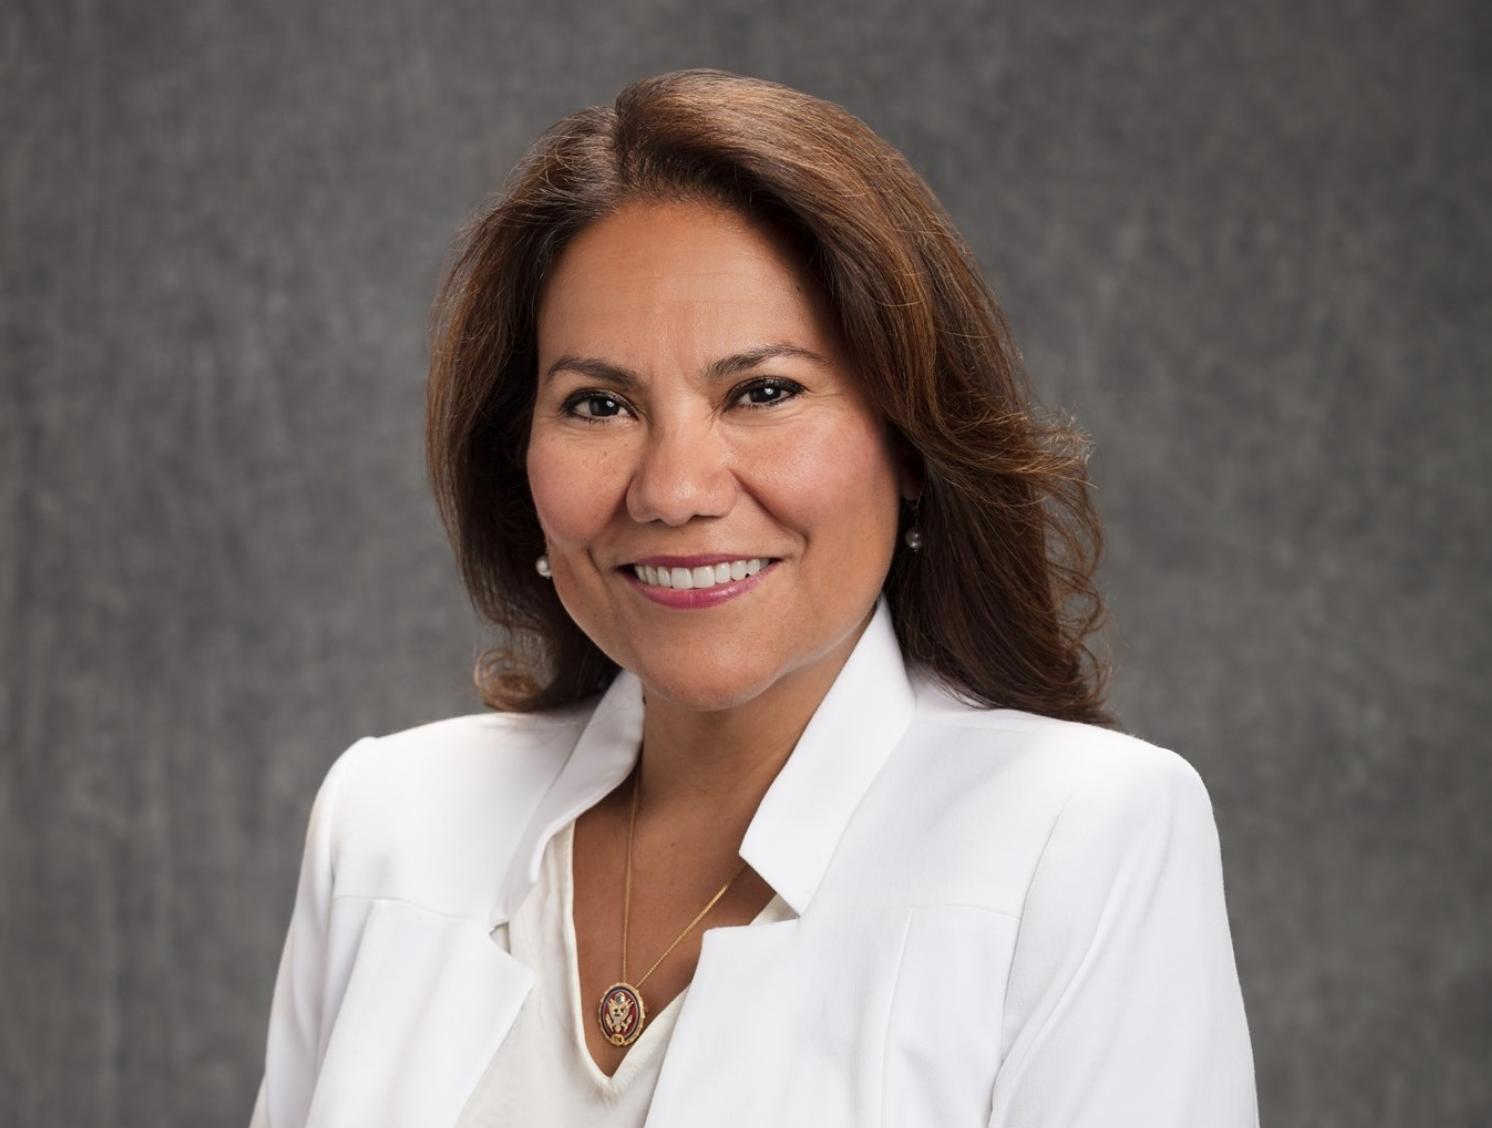 Veronica Escobar Joins Lawsuit Against Trump